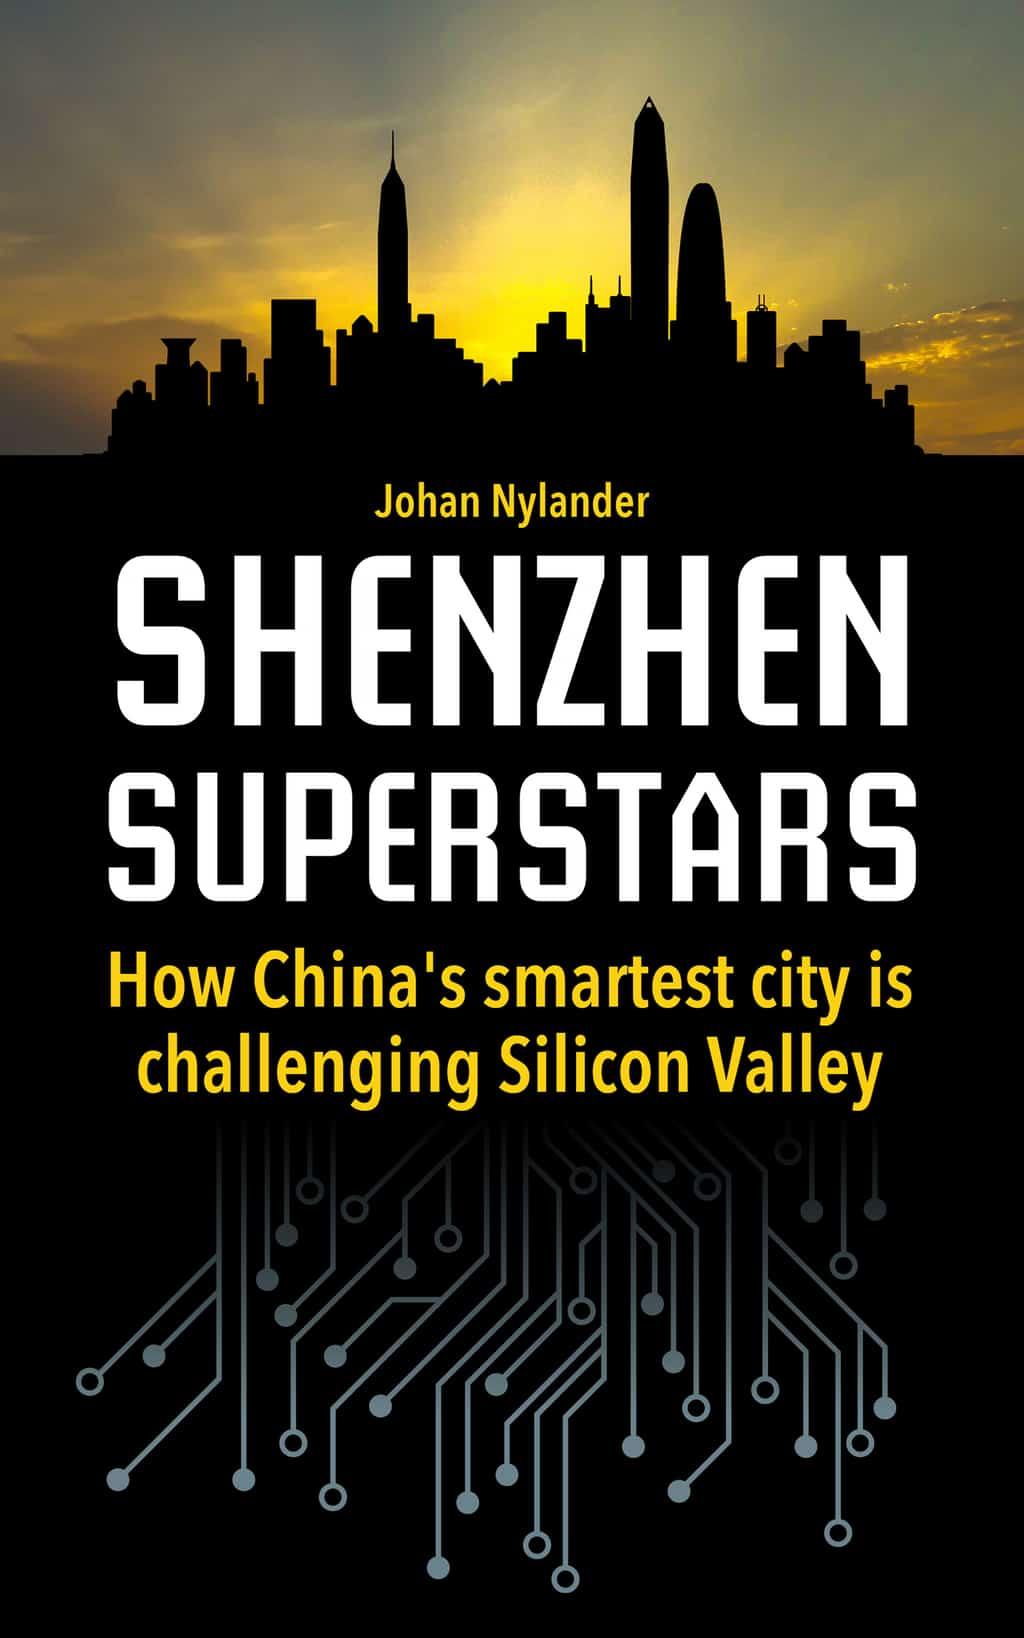 Shenzhen Super Stars book